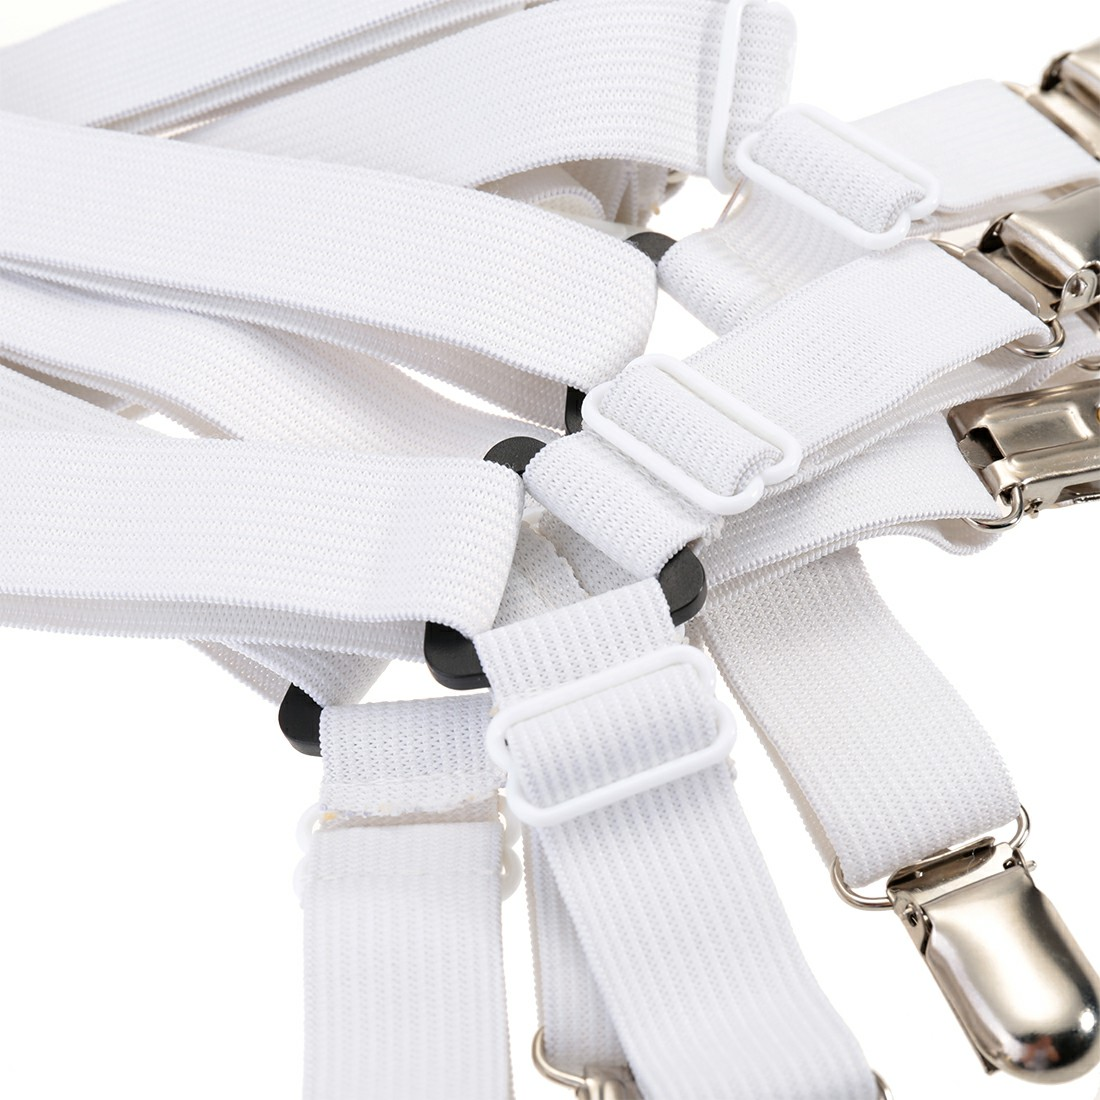 Triangle Sheet Straps Adjustable Bed Sheet Fastener Suspenders Grippers Corner Holder - White